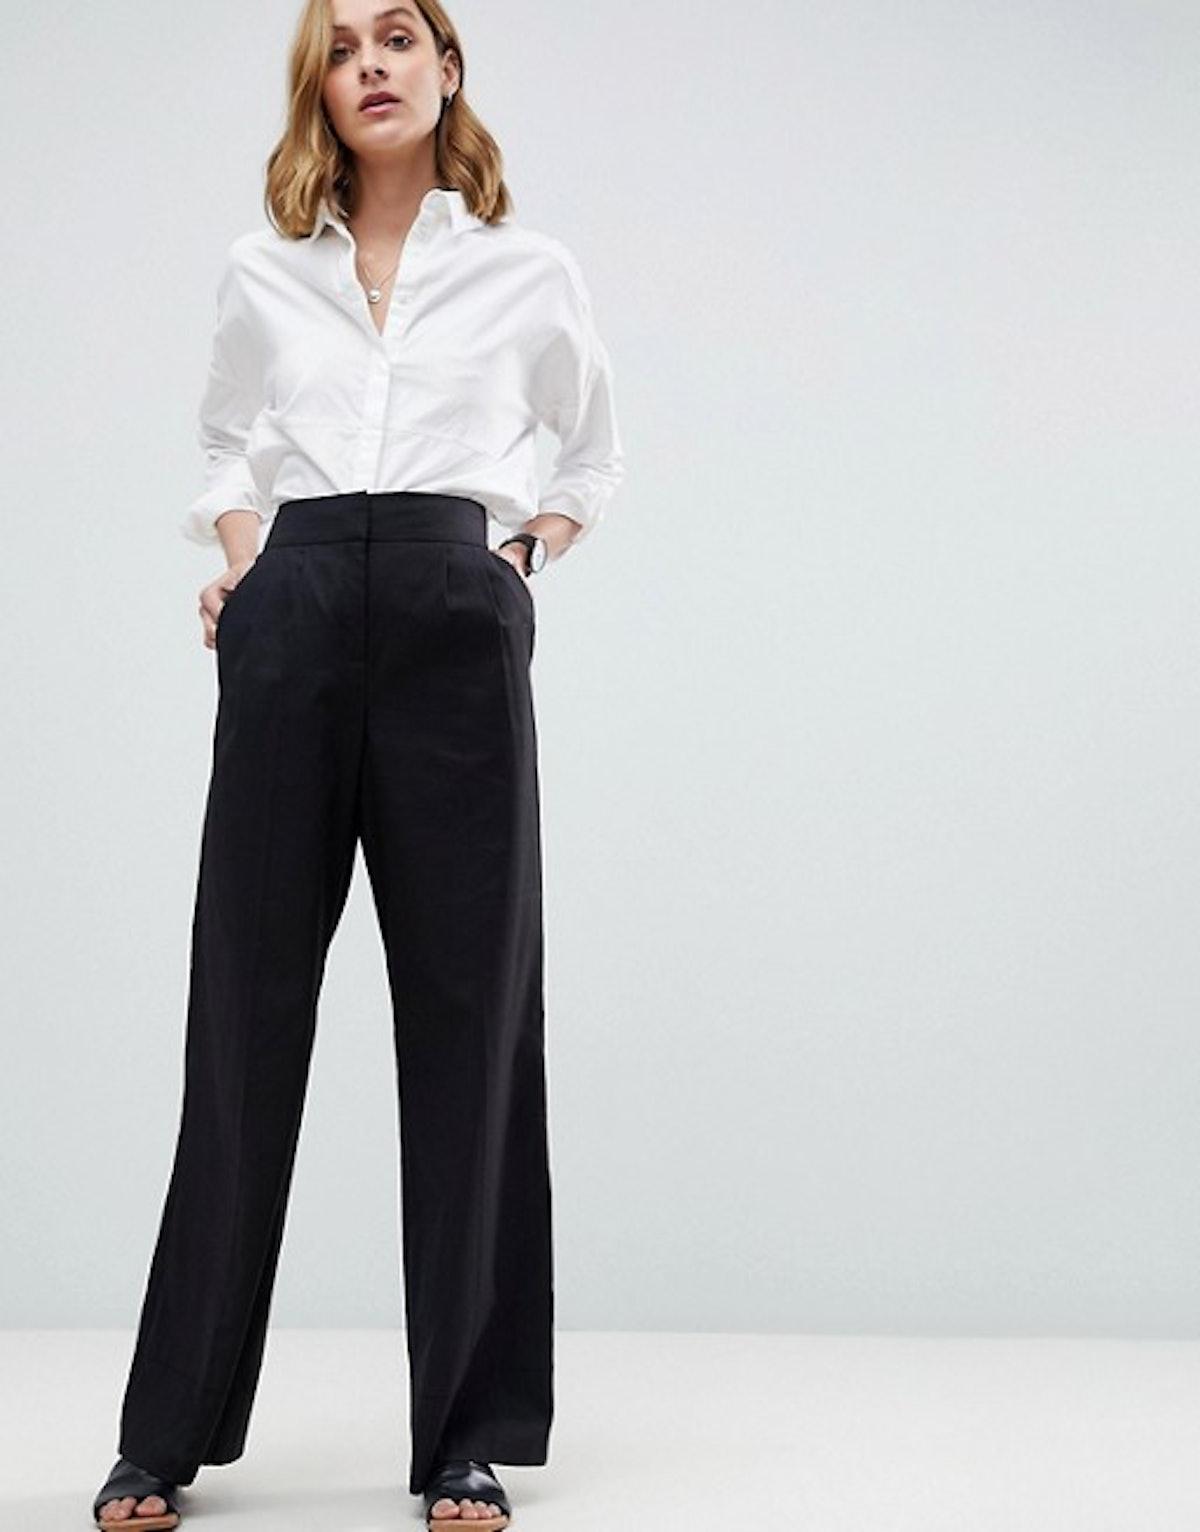 ASOS Tailored Clean Linen Wide Leg Pants